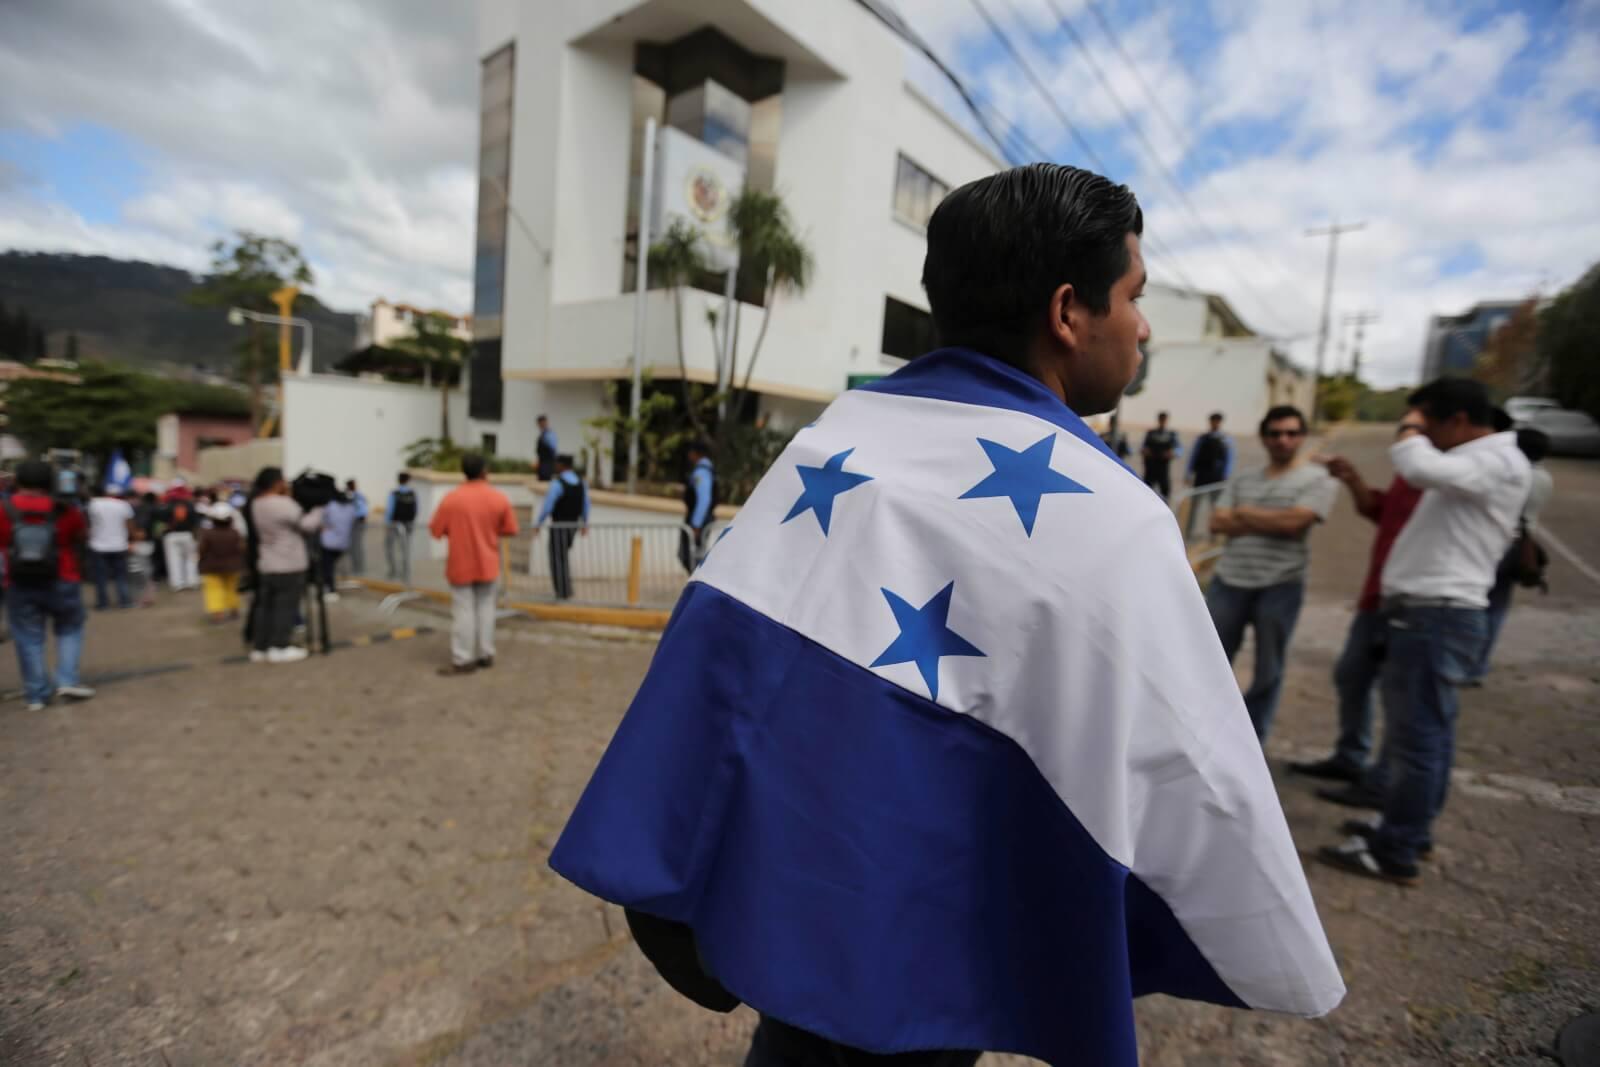 Kryzys w Hondurasie fot. EPA/Gustavo Amador